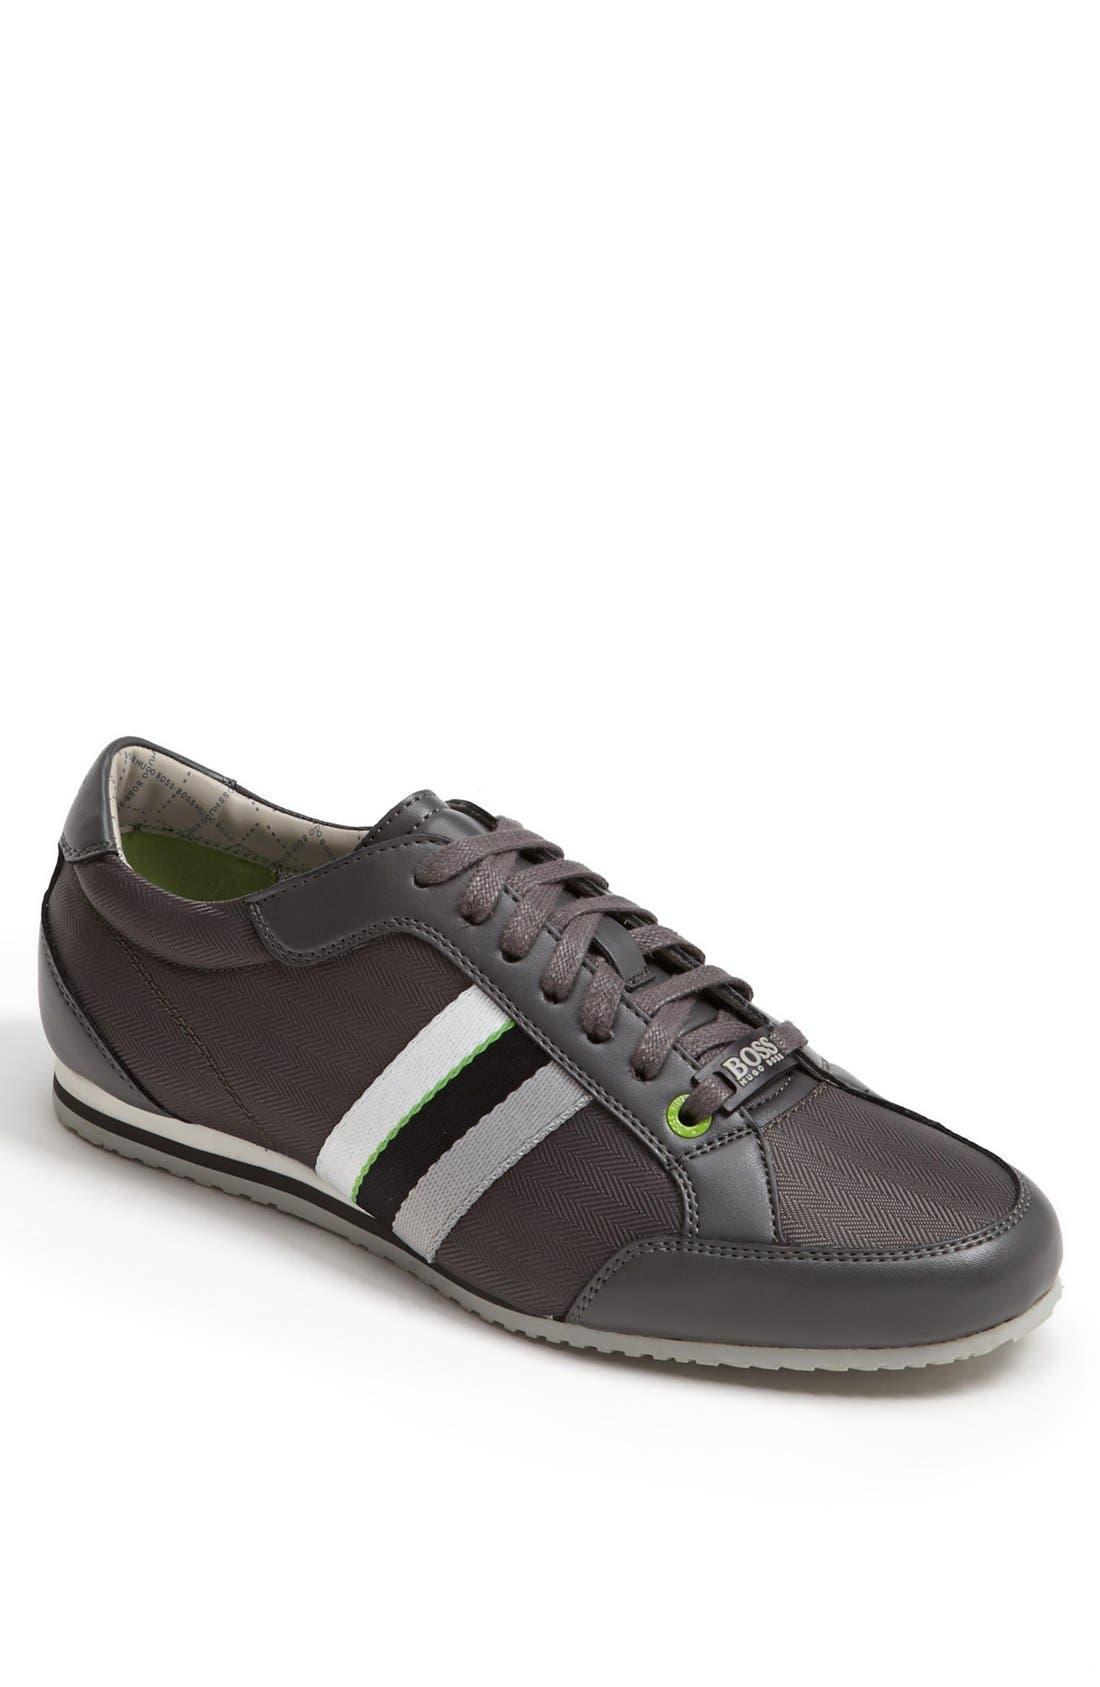 Alternate Image 1 Selected - BOSS Green 'Victoire Texas' Sneaker